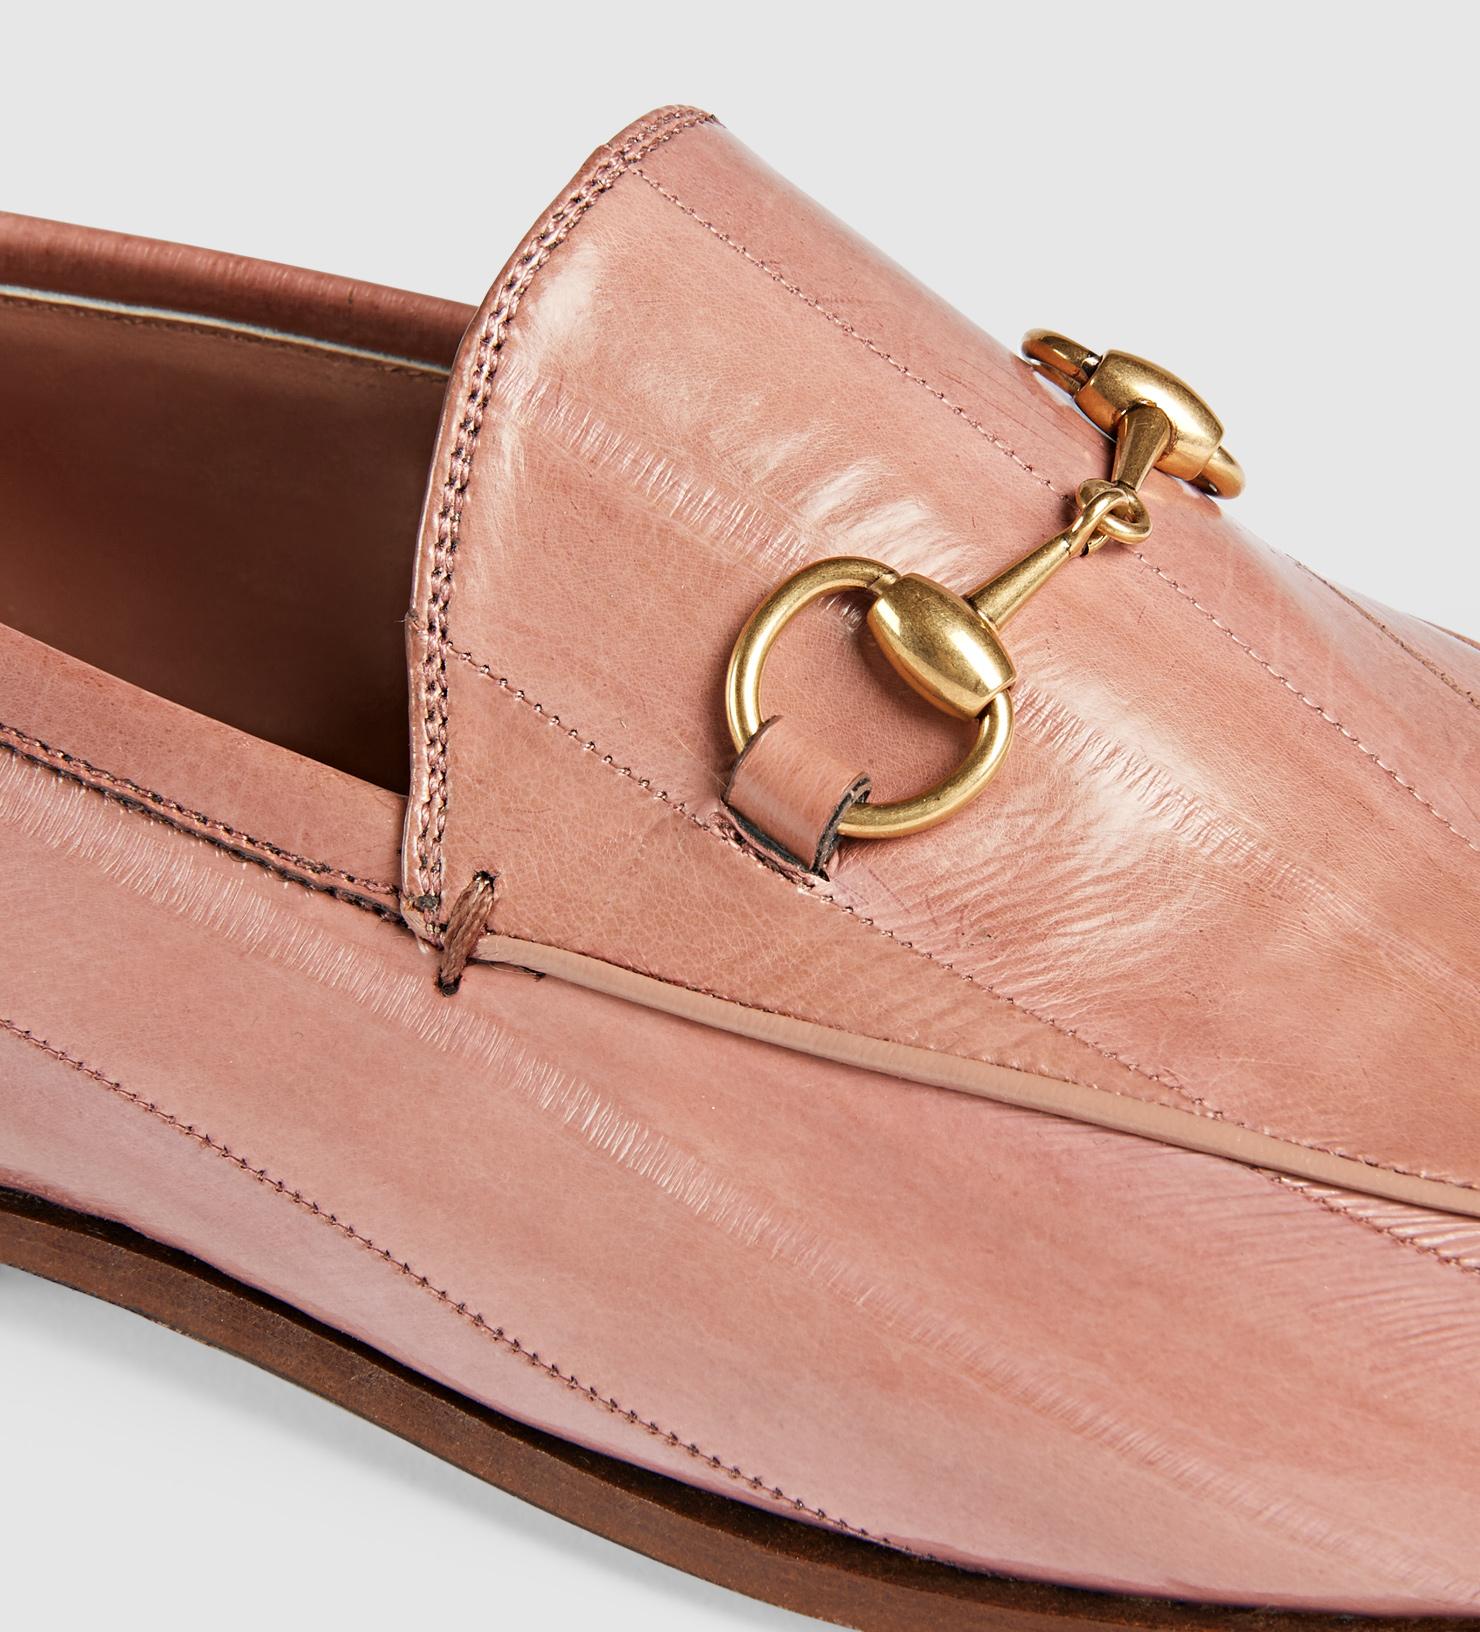 da5d28926eb Lyst - Gucci Jordaan Eel Loafer in Pink